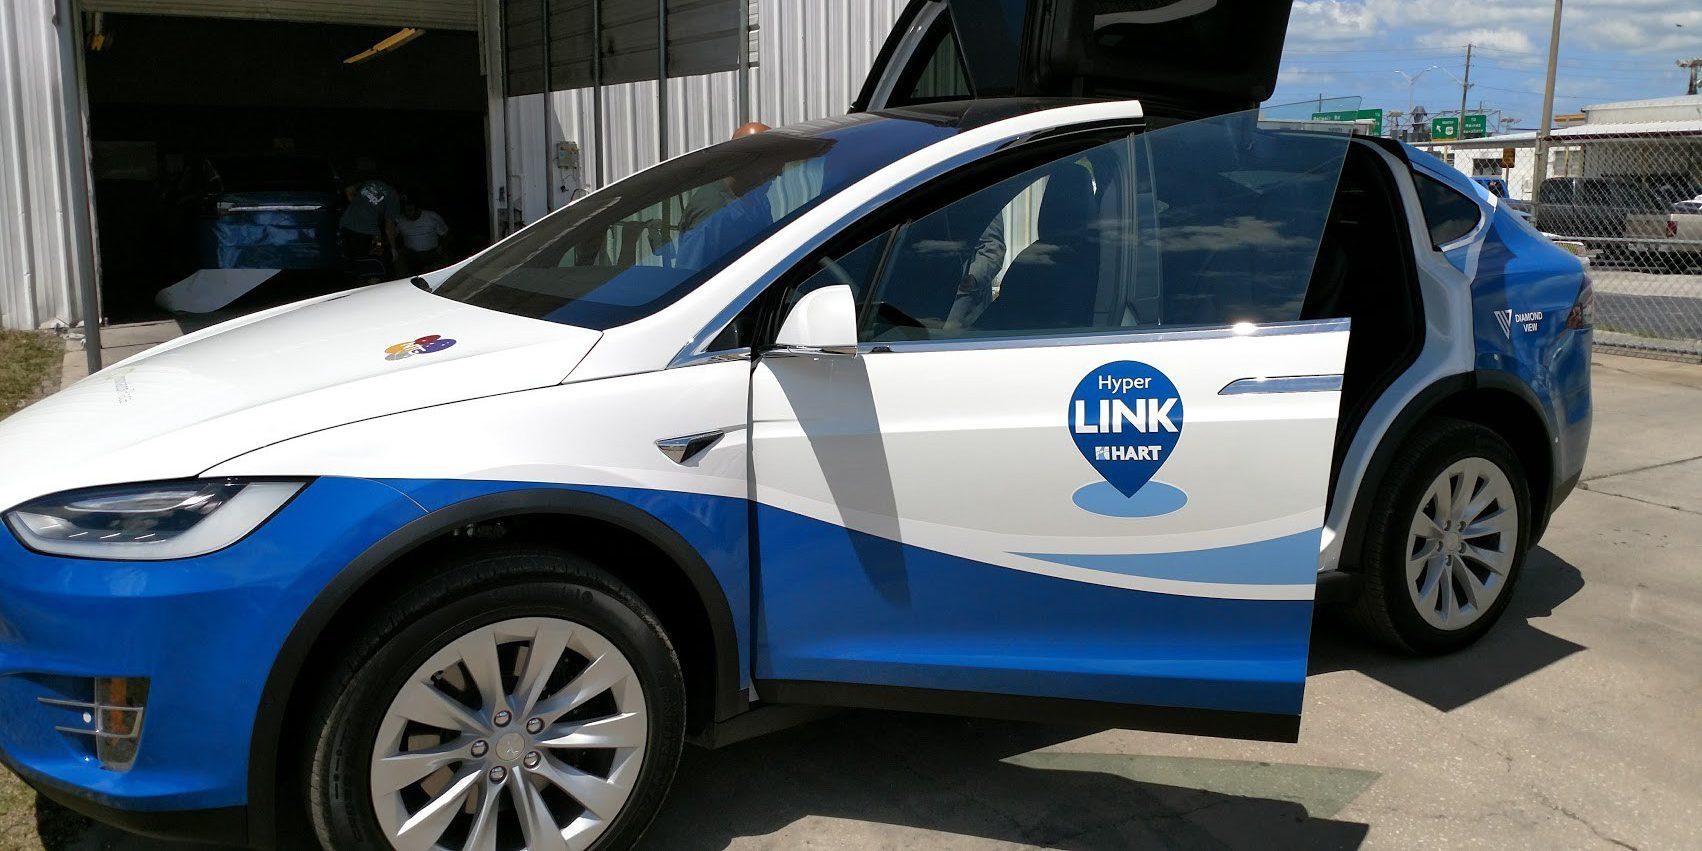 4 Tesla Model X Suvs Delivered To Transit Agency To Test A